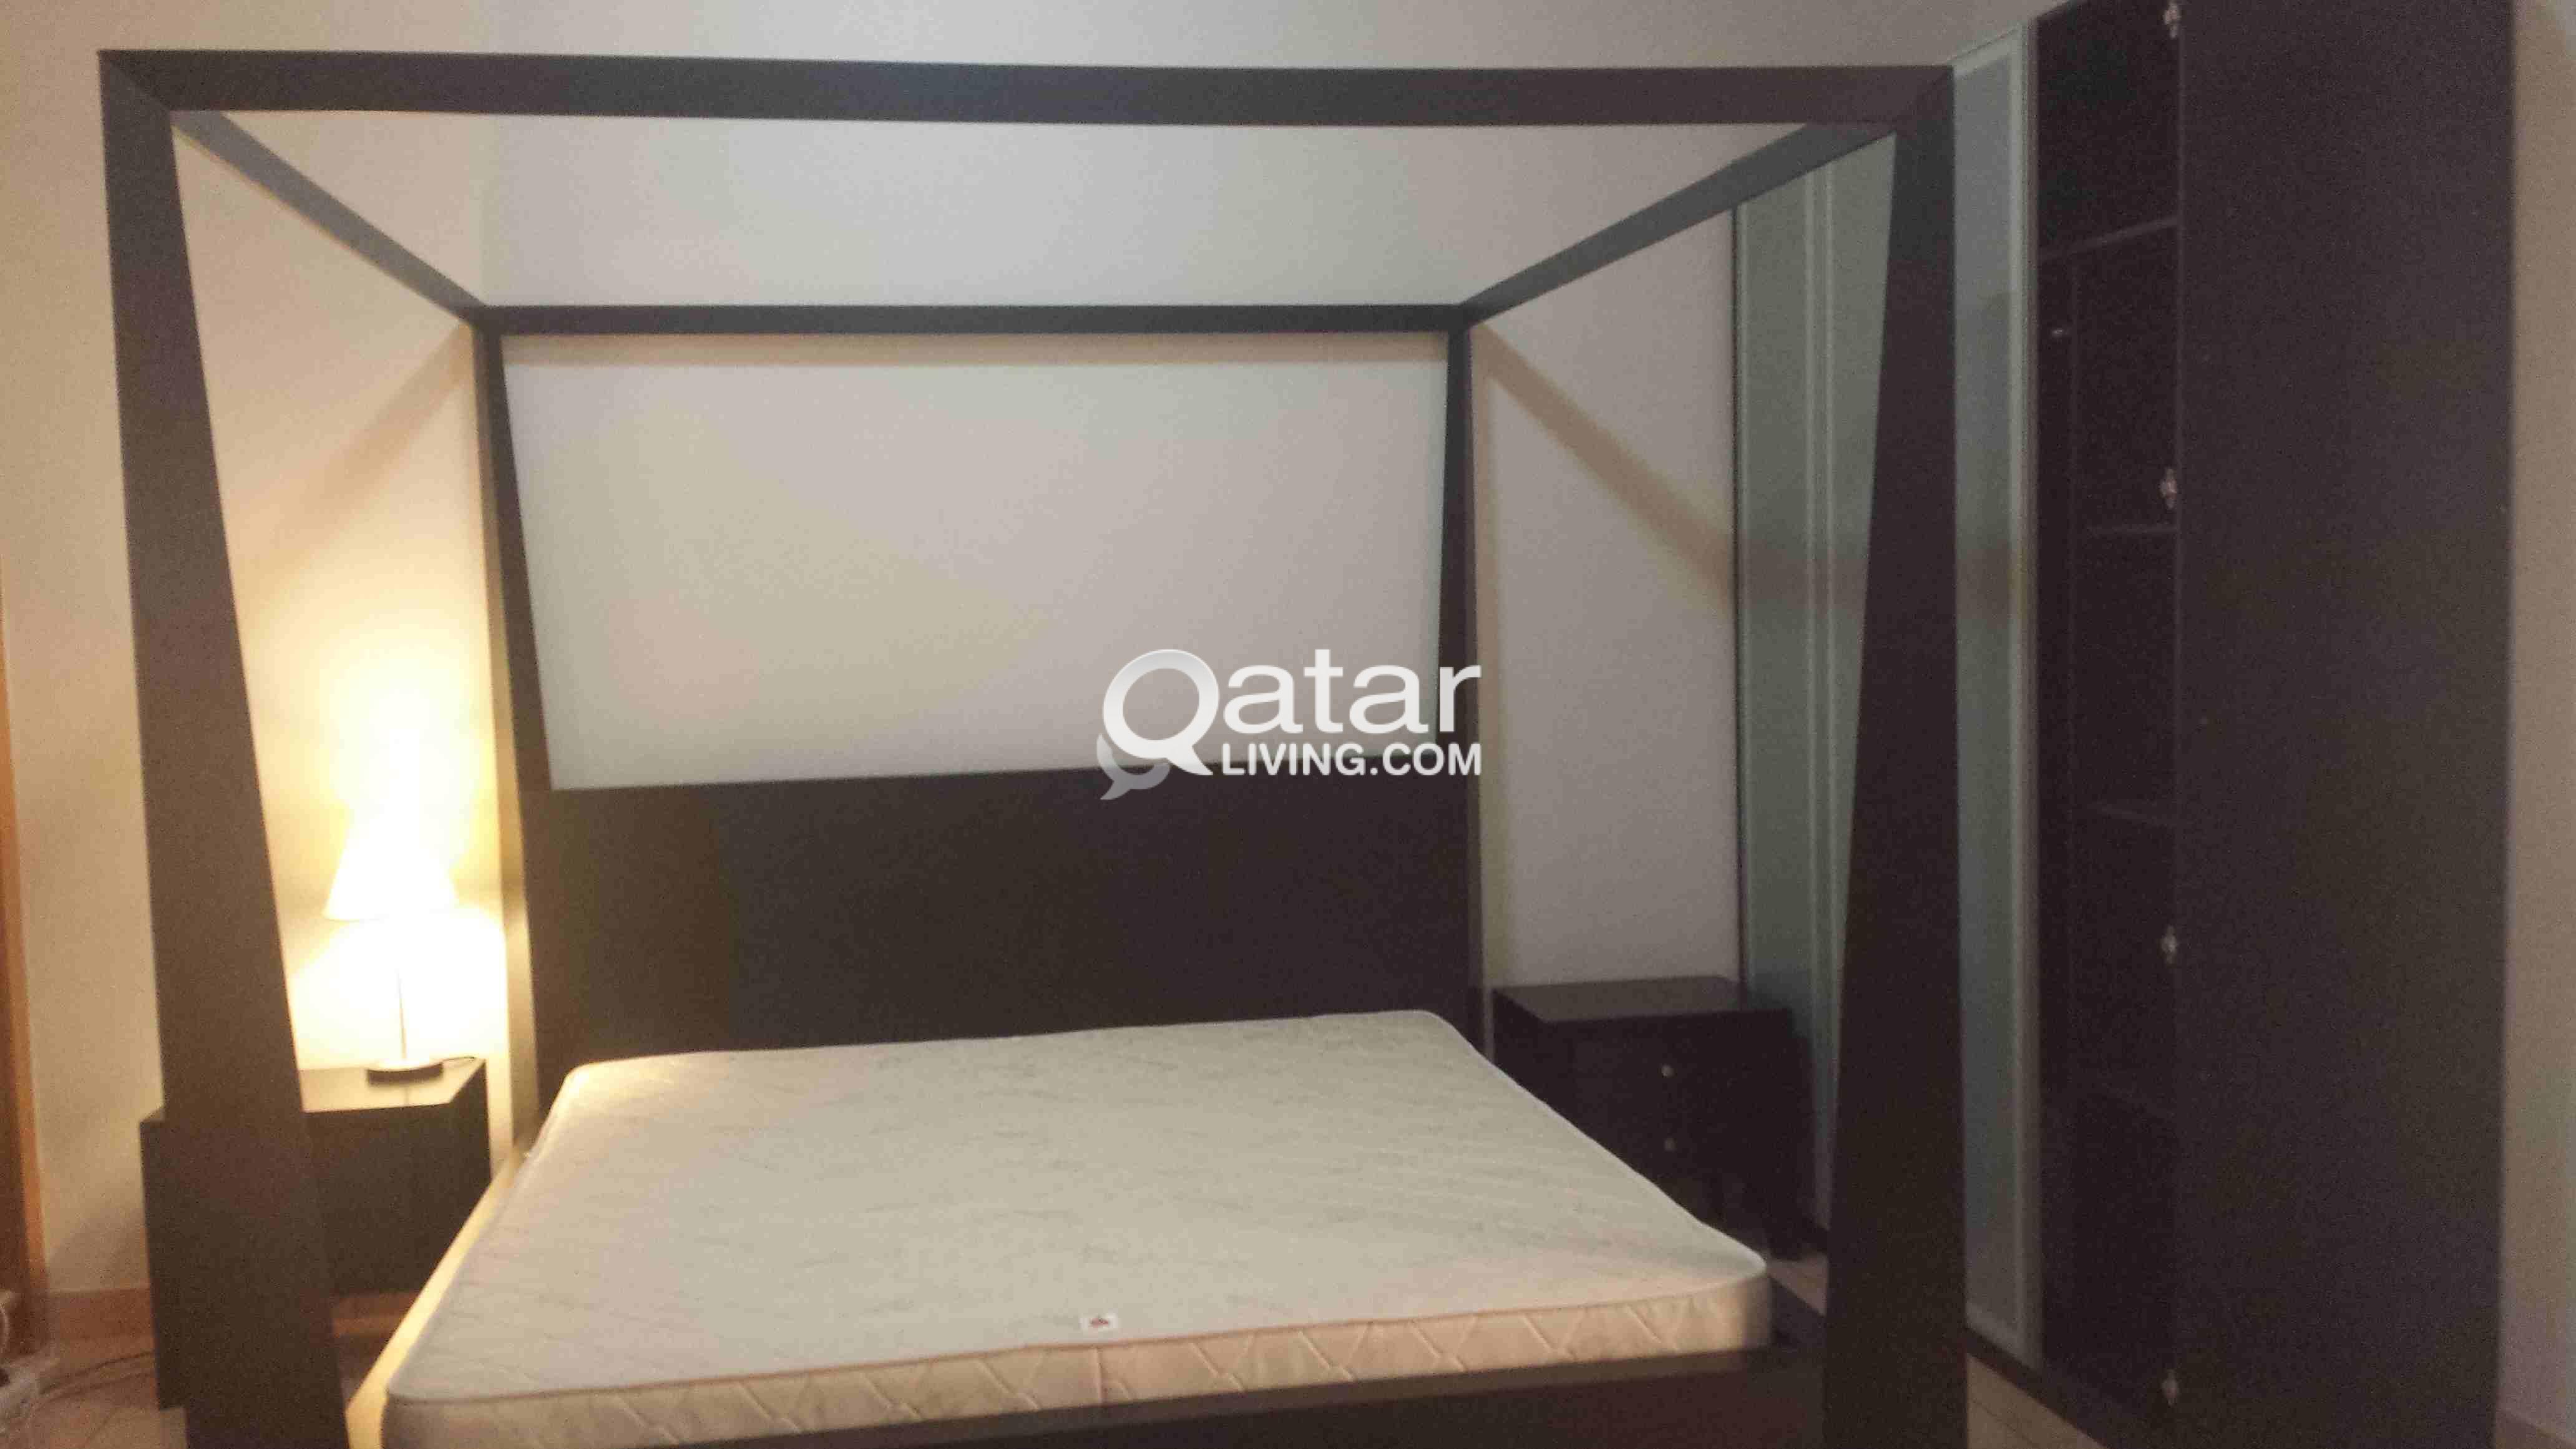 Home Sense Bedroom Set Qatar Living